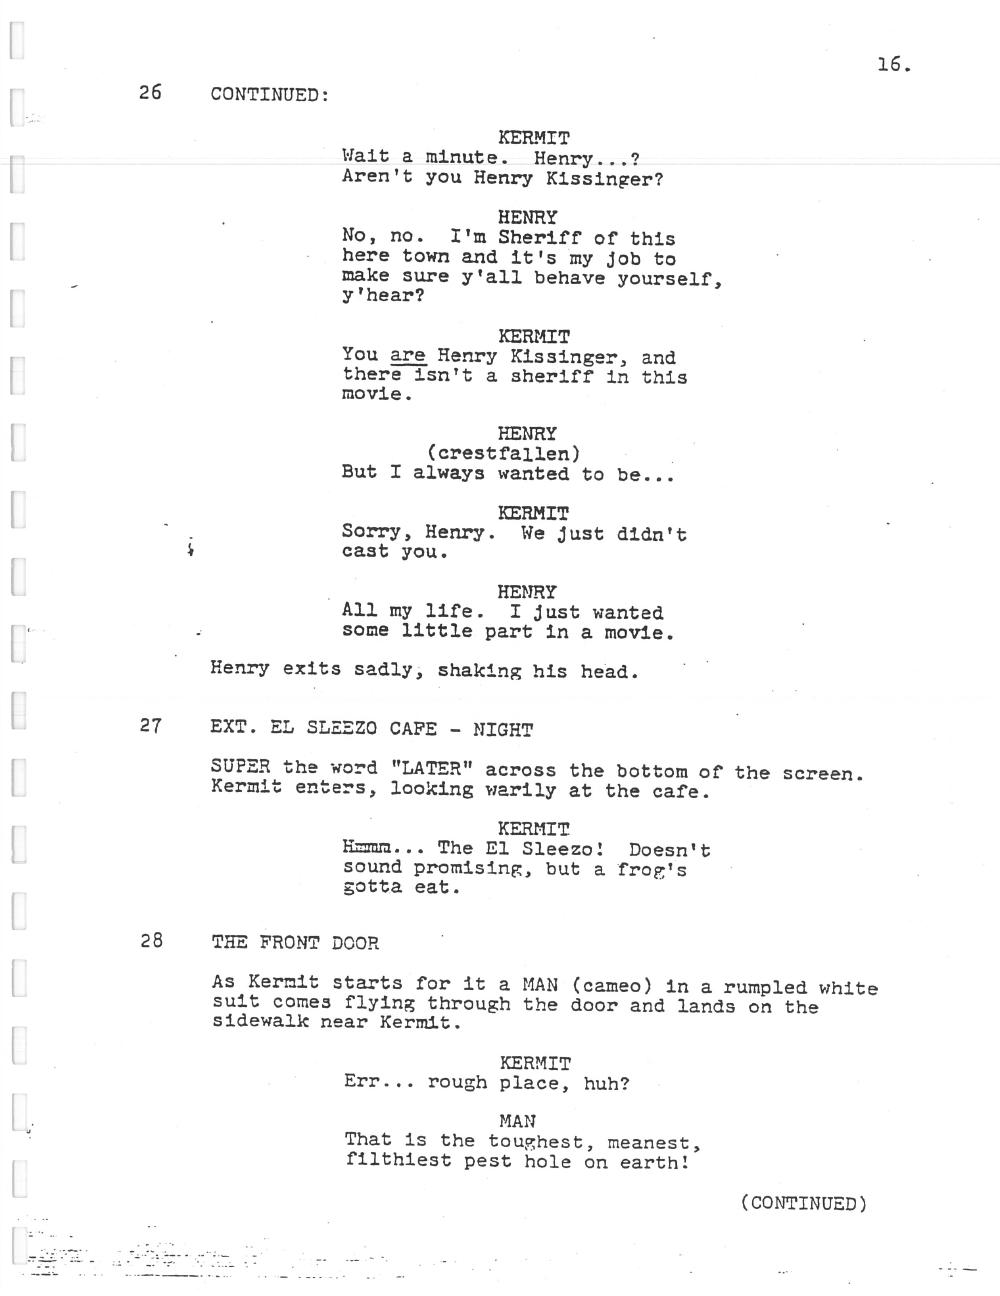 image muppet movie script 016 jpg muppet wiki fandom powered